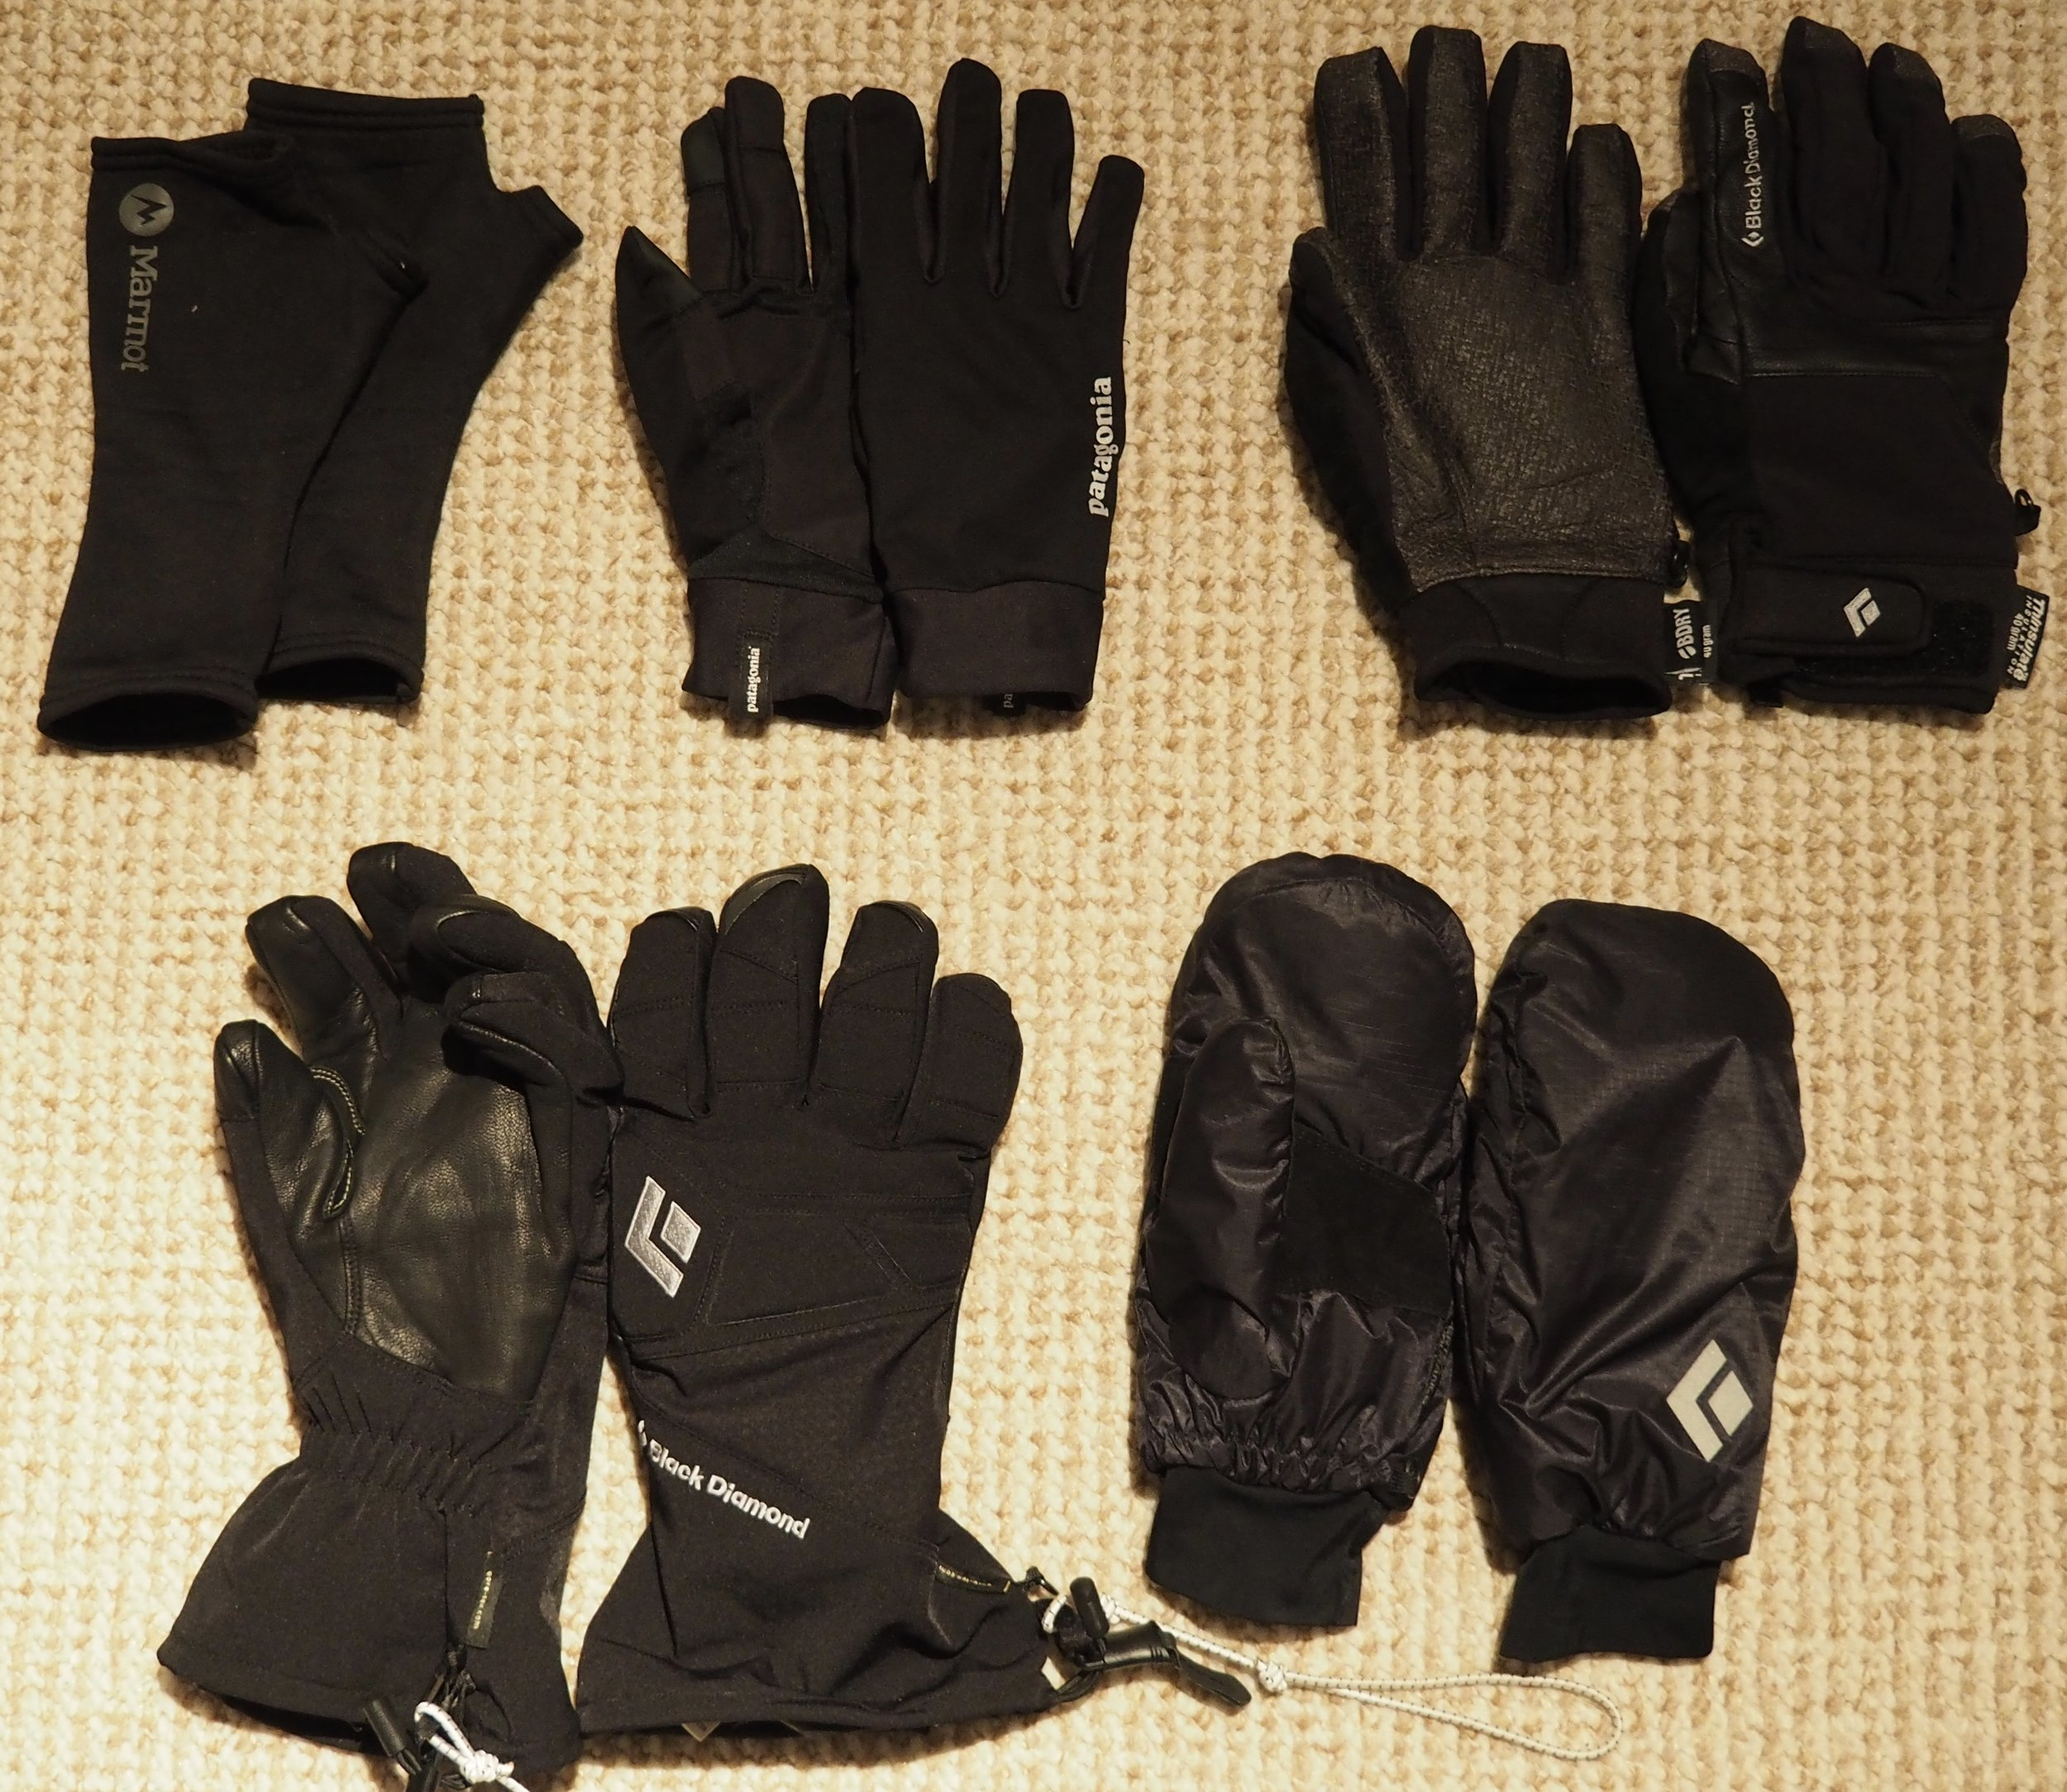 Top: Marmot Wrist Gaiters, Patagonia Fore Runner Gloves, Black Diamond Arc Glove Bottom: Black Diamond Enforcers, Black Diamond Stance Mitts